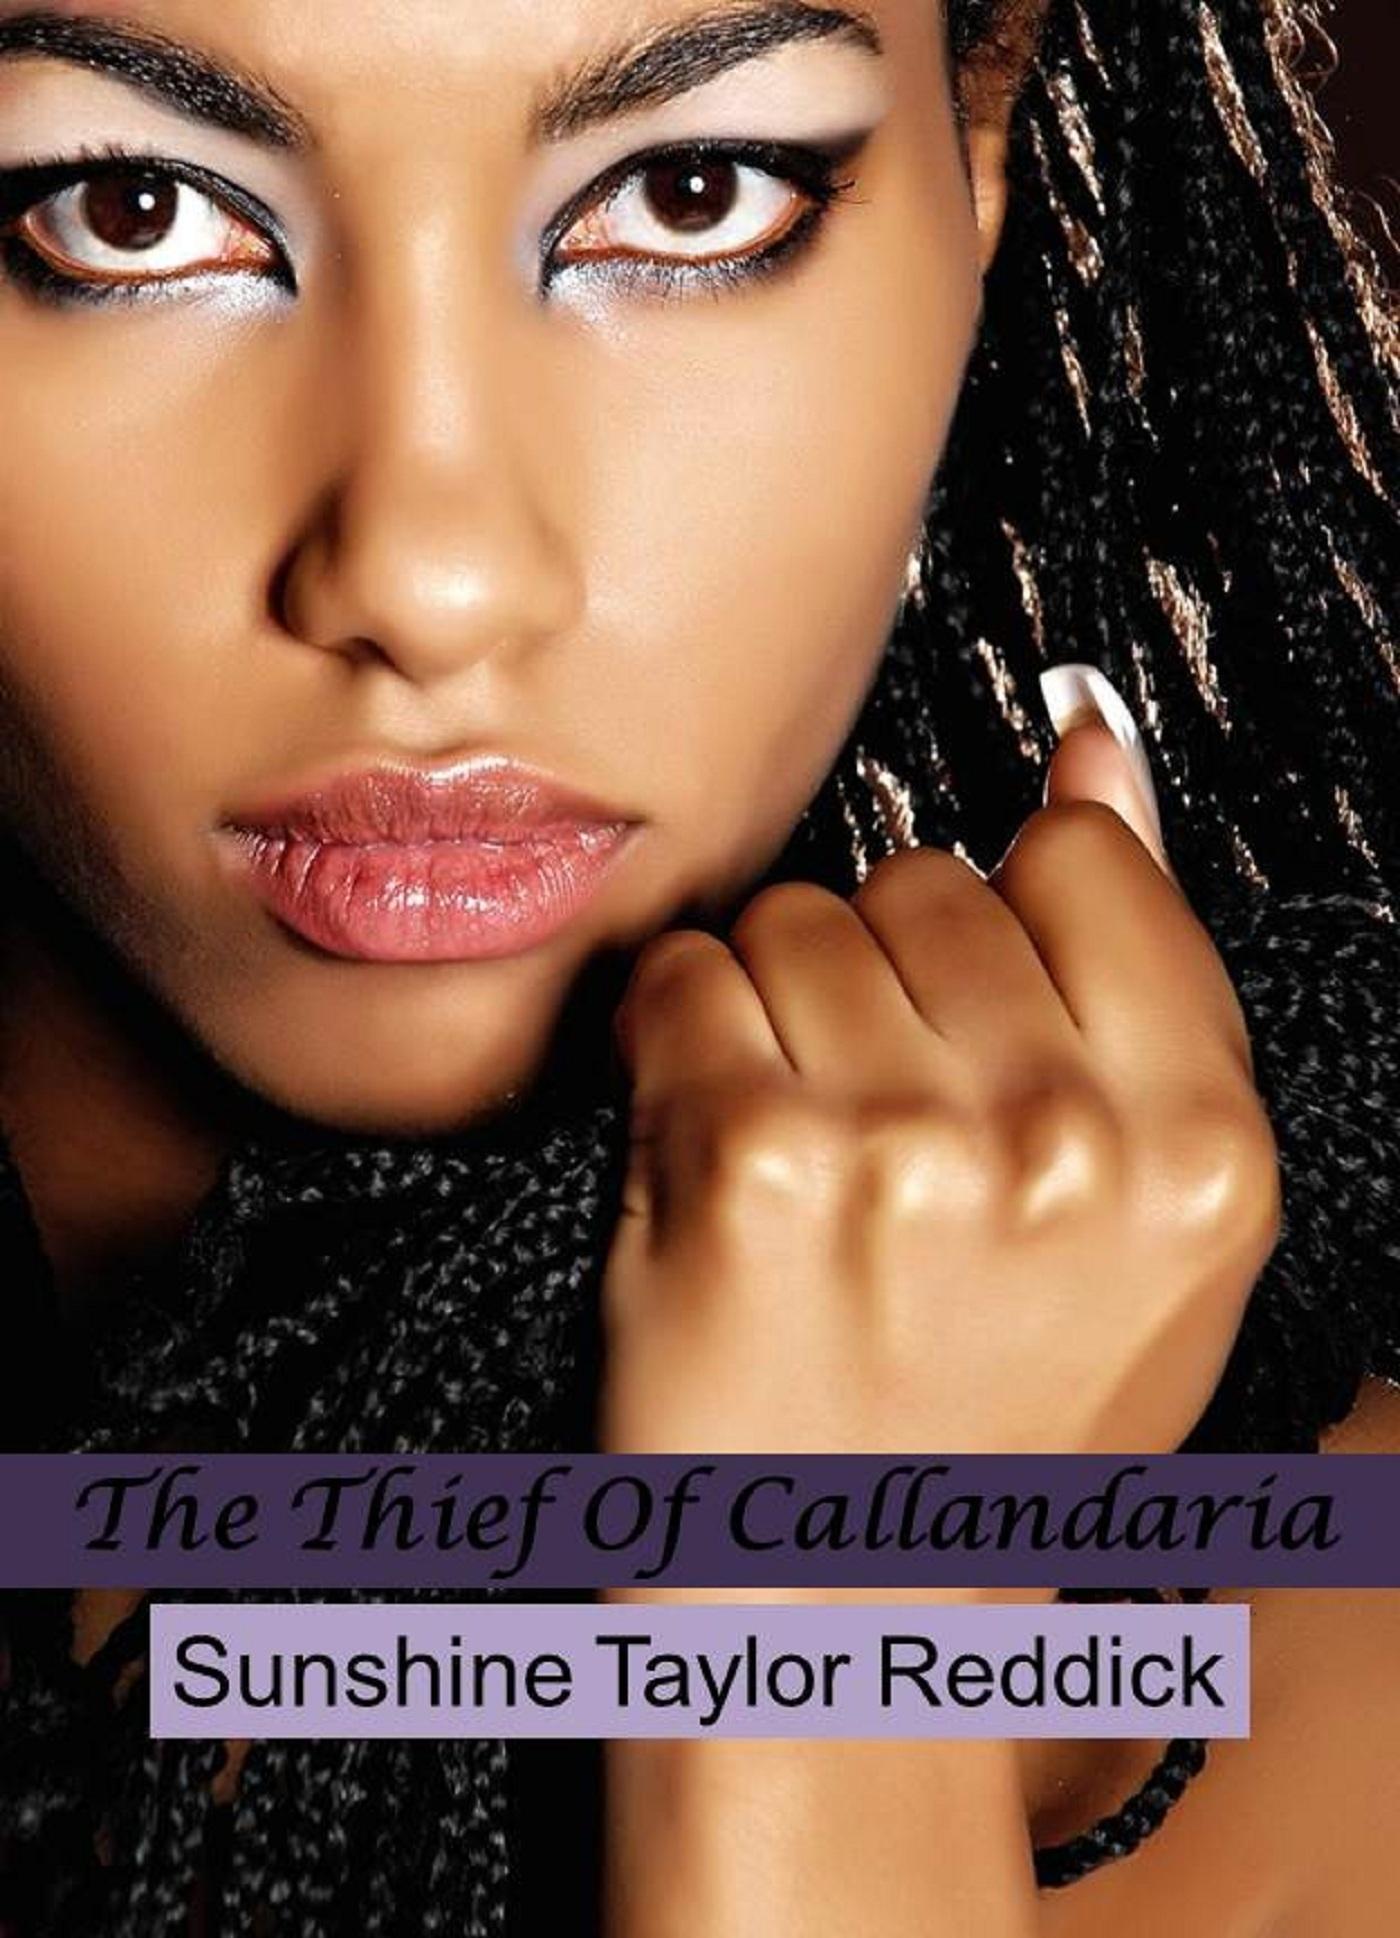 The Thief Of Callandaria  by  Sunshine Taylor Reddick